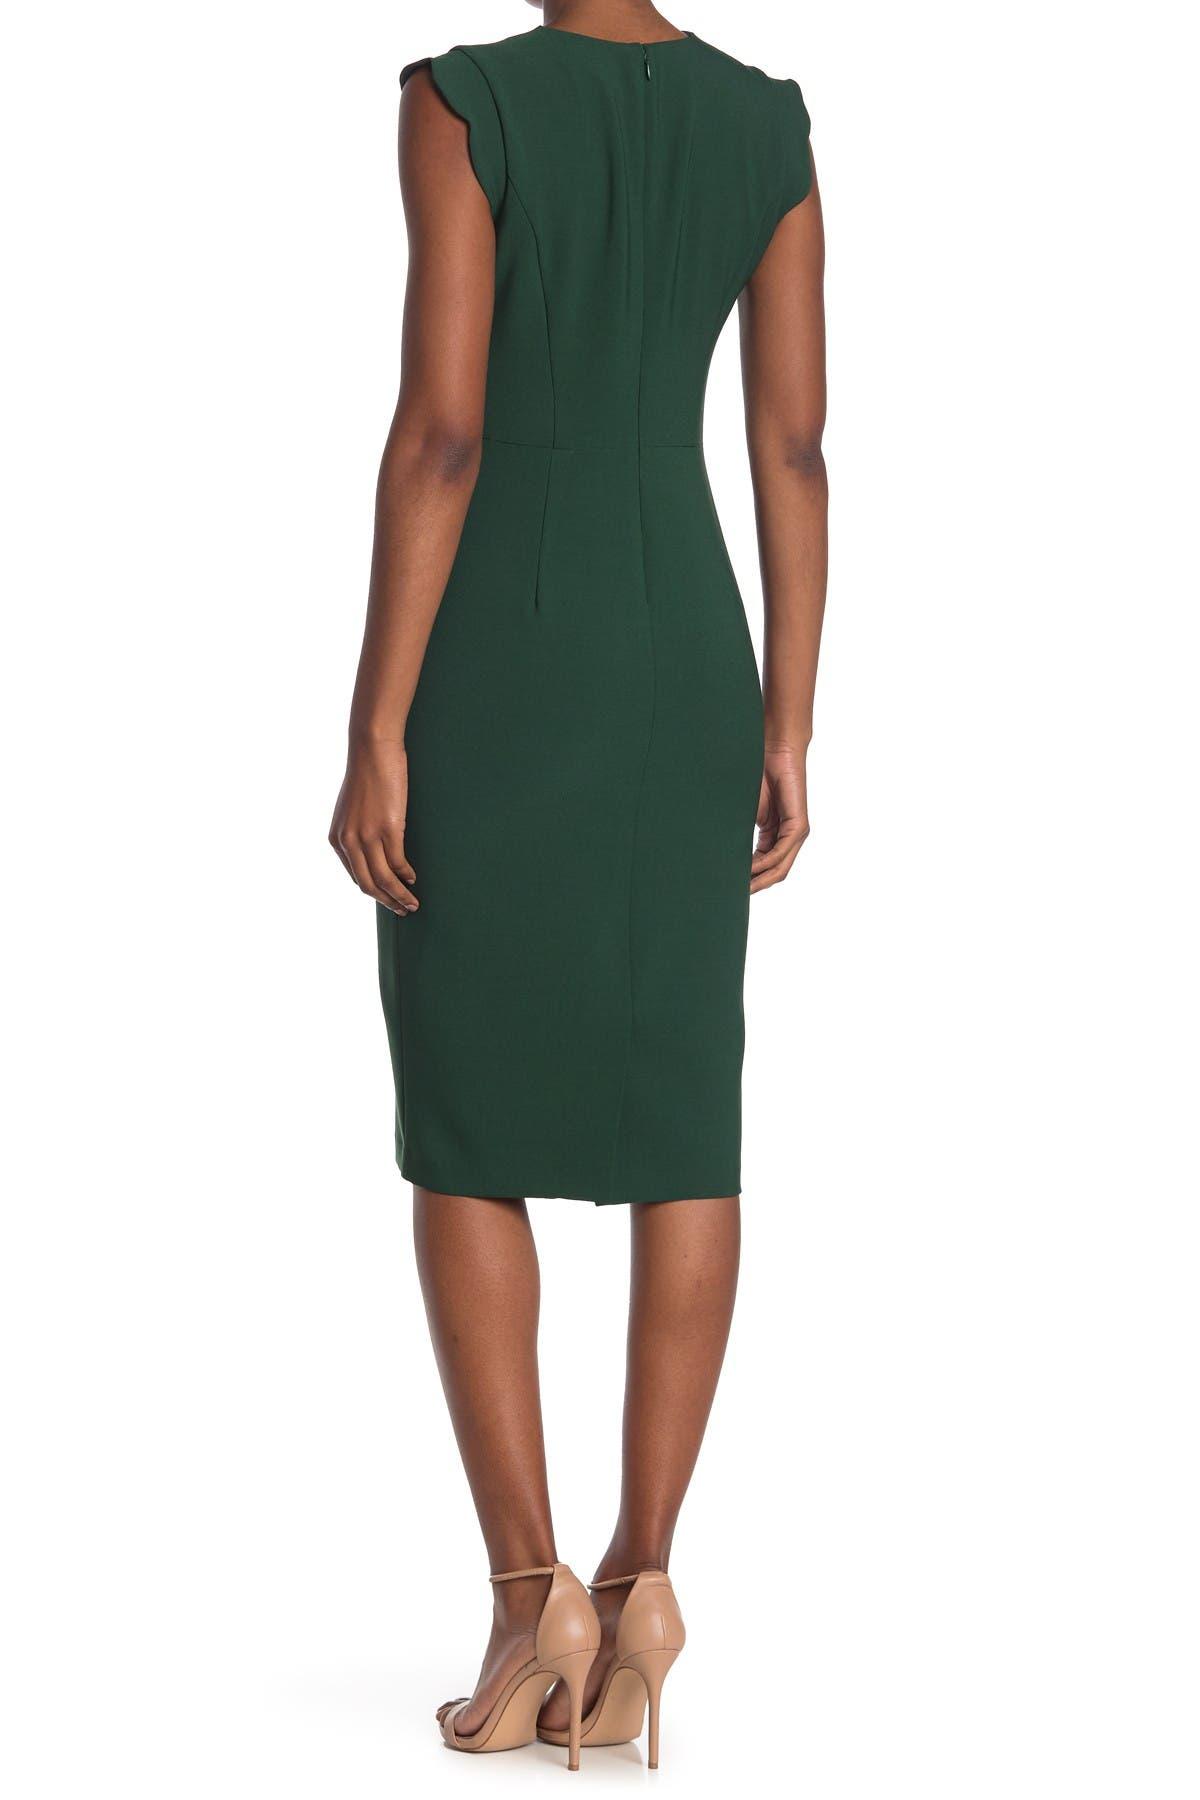 Image of Maggy London Scallop Sheath Dress